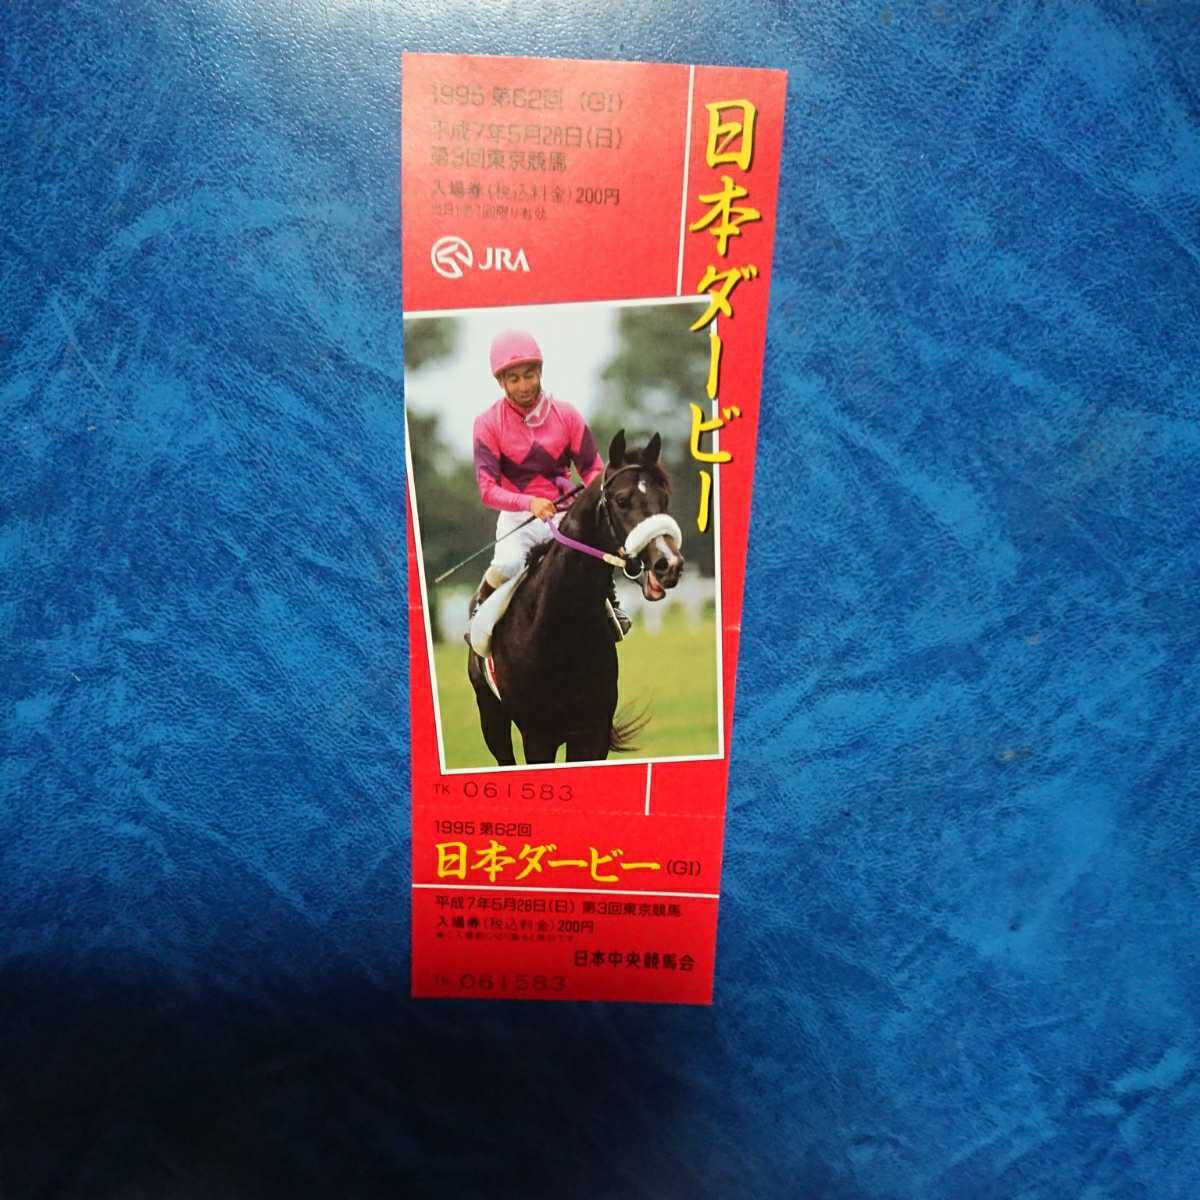 JRA 1995 第62回 日本ダービー 記念入場券 東京競馬場 ナリタブライアン 南井騎手 デザイン 送料込み